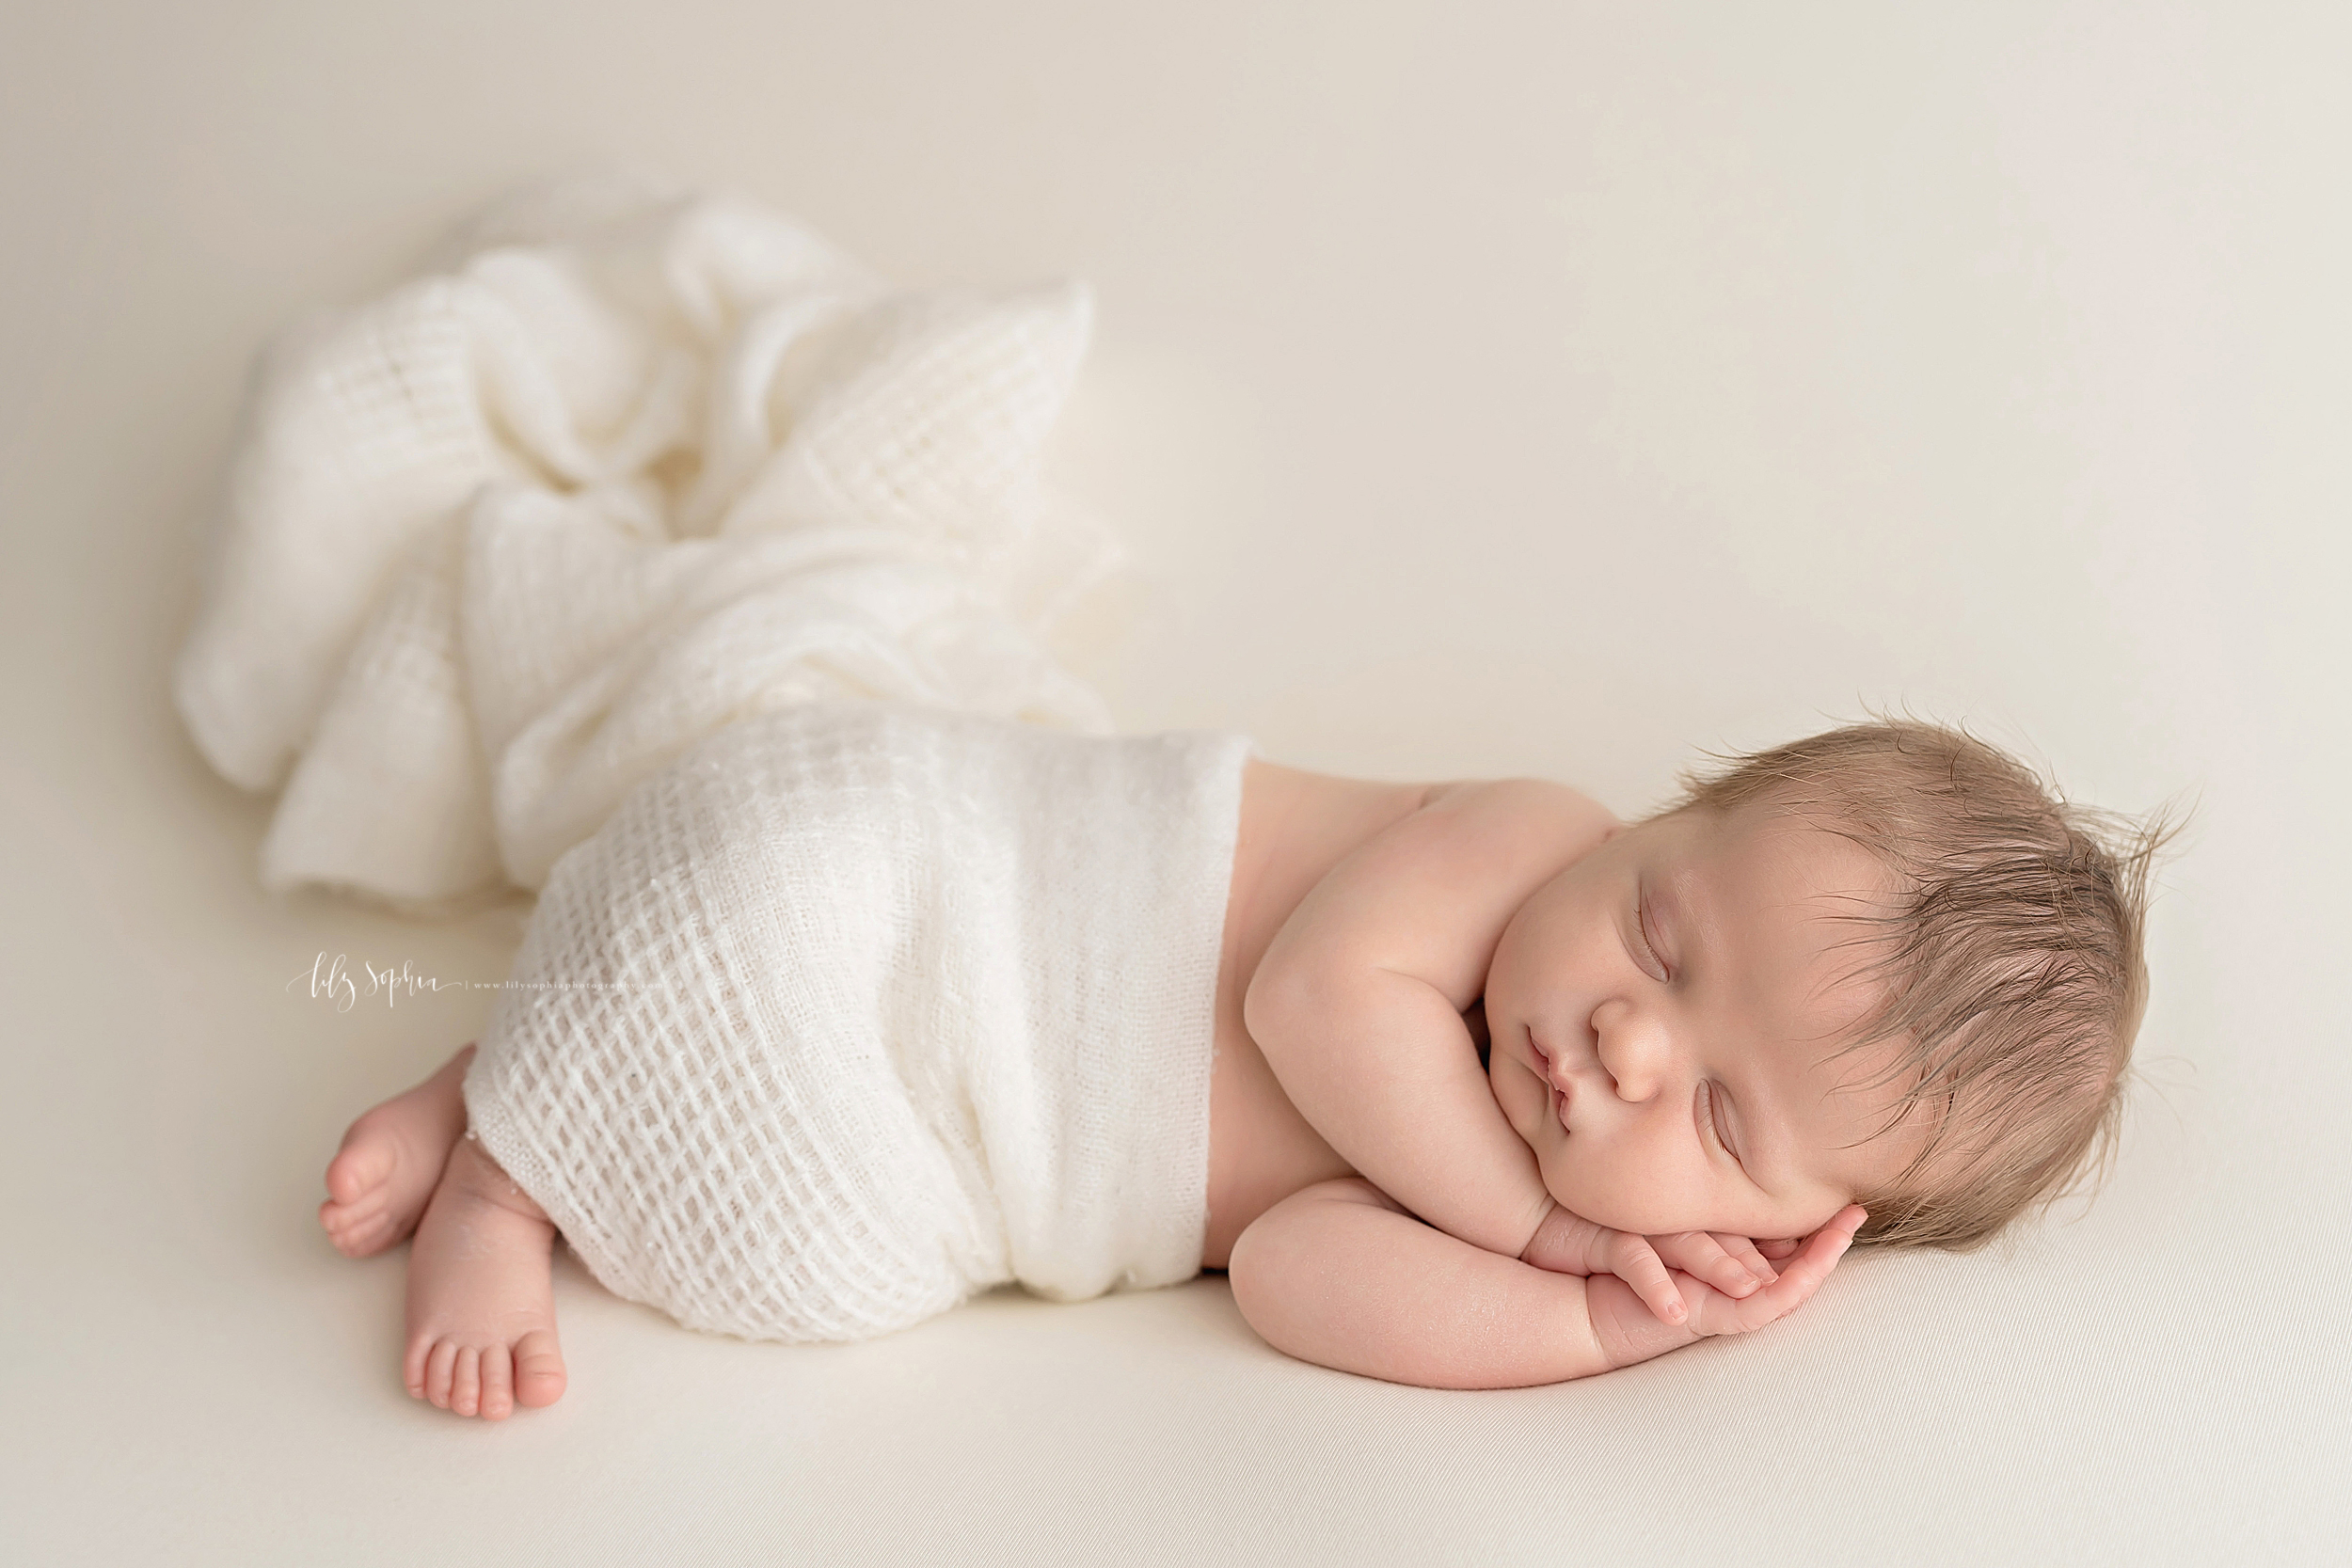 atlanta-midtown-brookhaven-ashford-dunwoody-virginia-highlands-roswell-decatur-lily-sophia-photography-newborn-baby-boy-big-brother-family-studio-session_0592.jpg